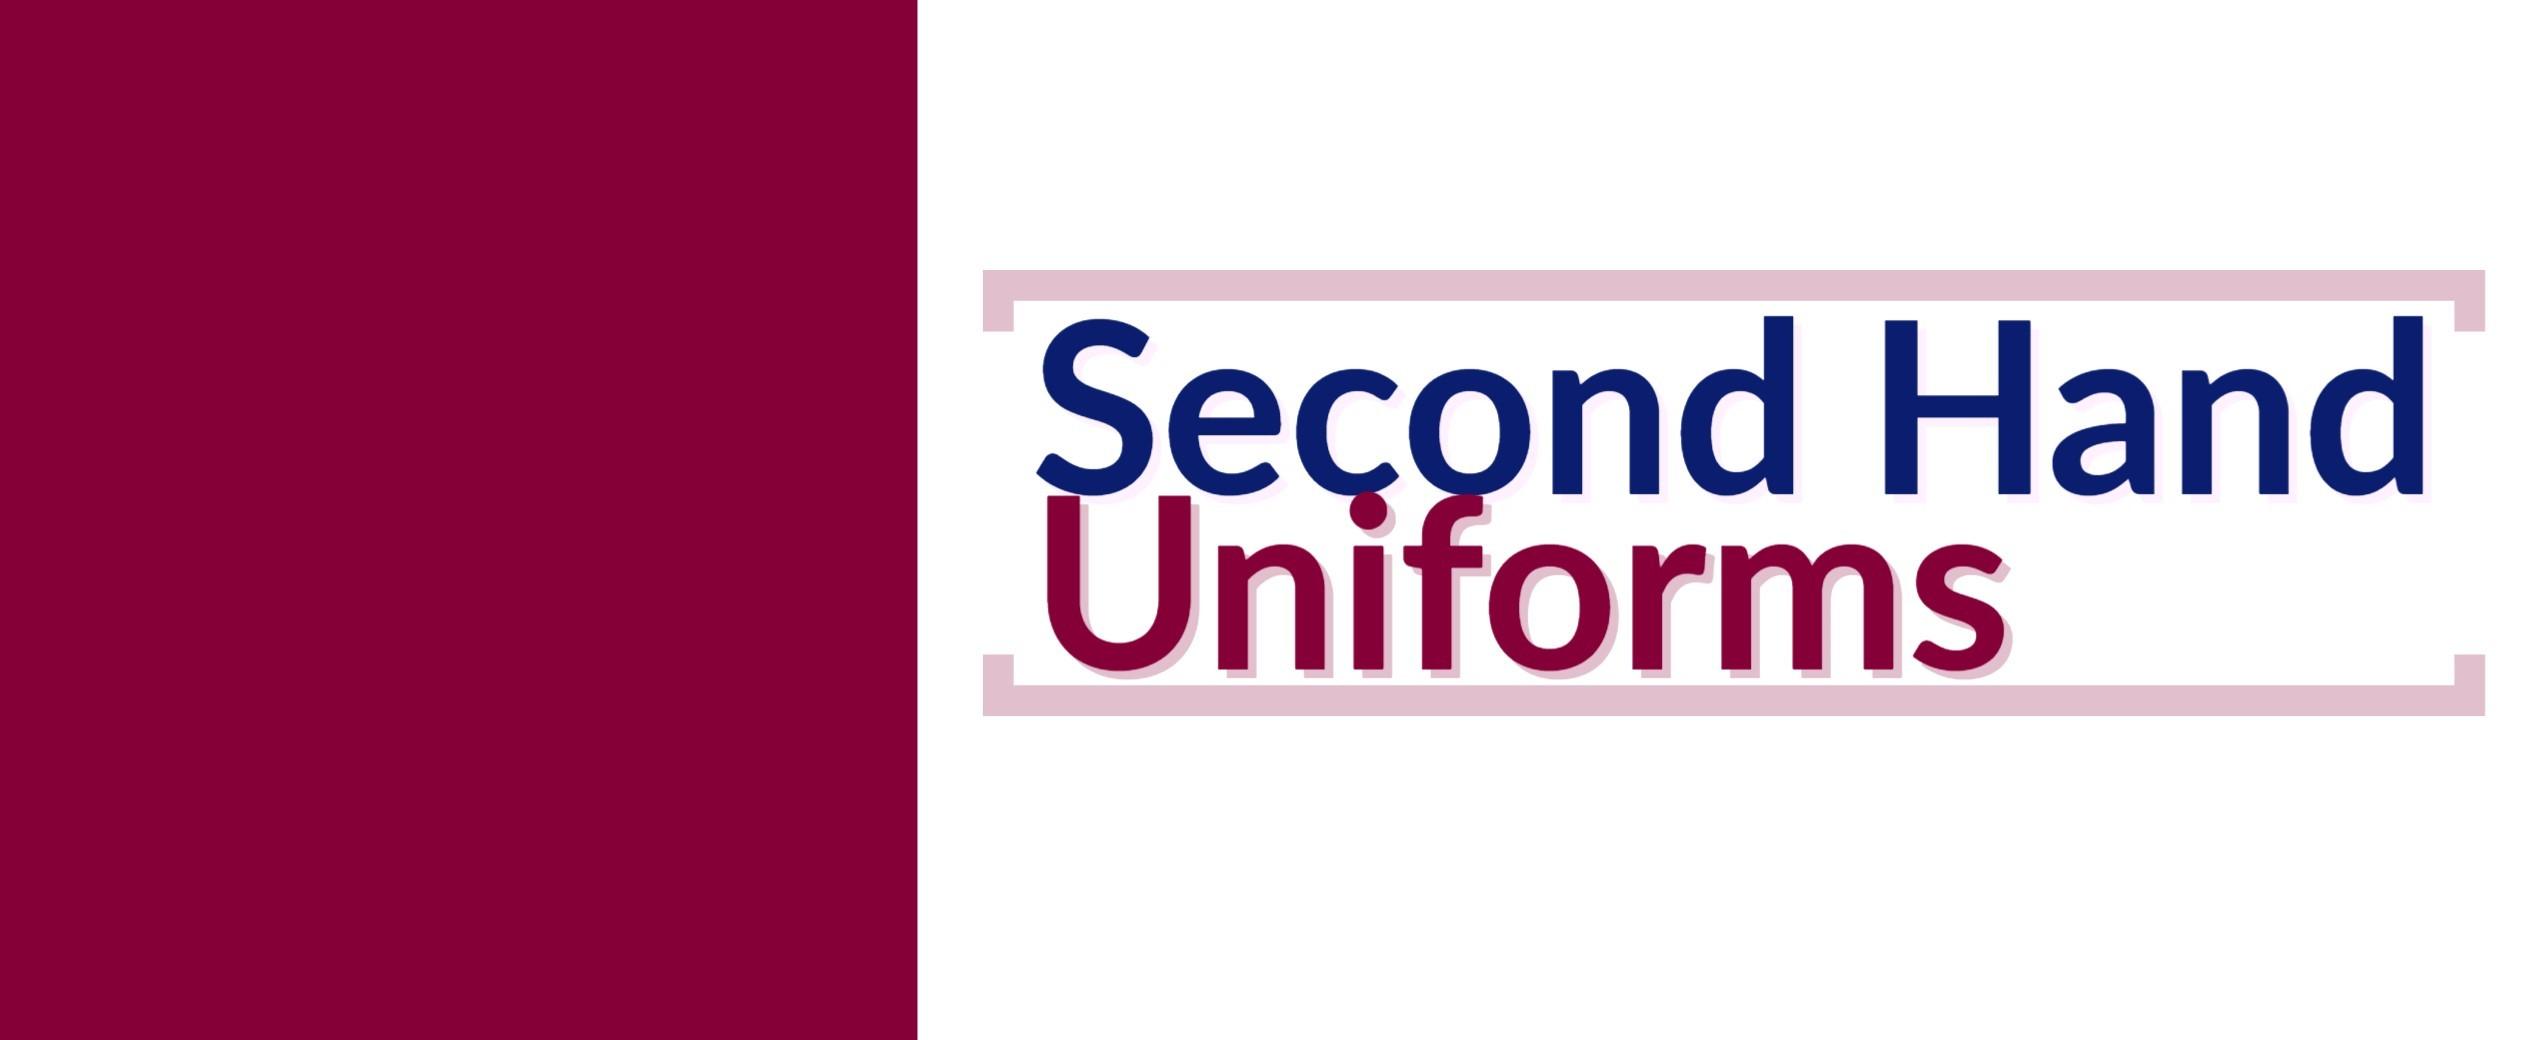 Second Hand Uniforms